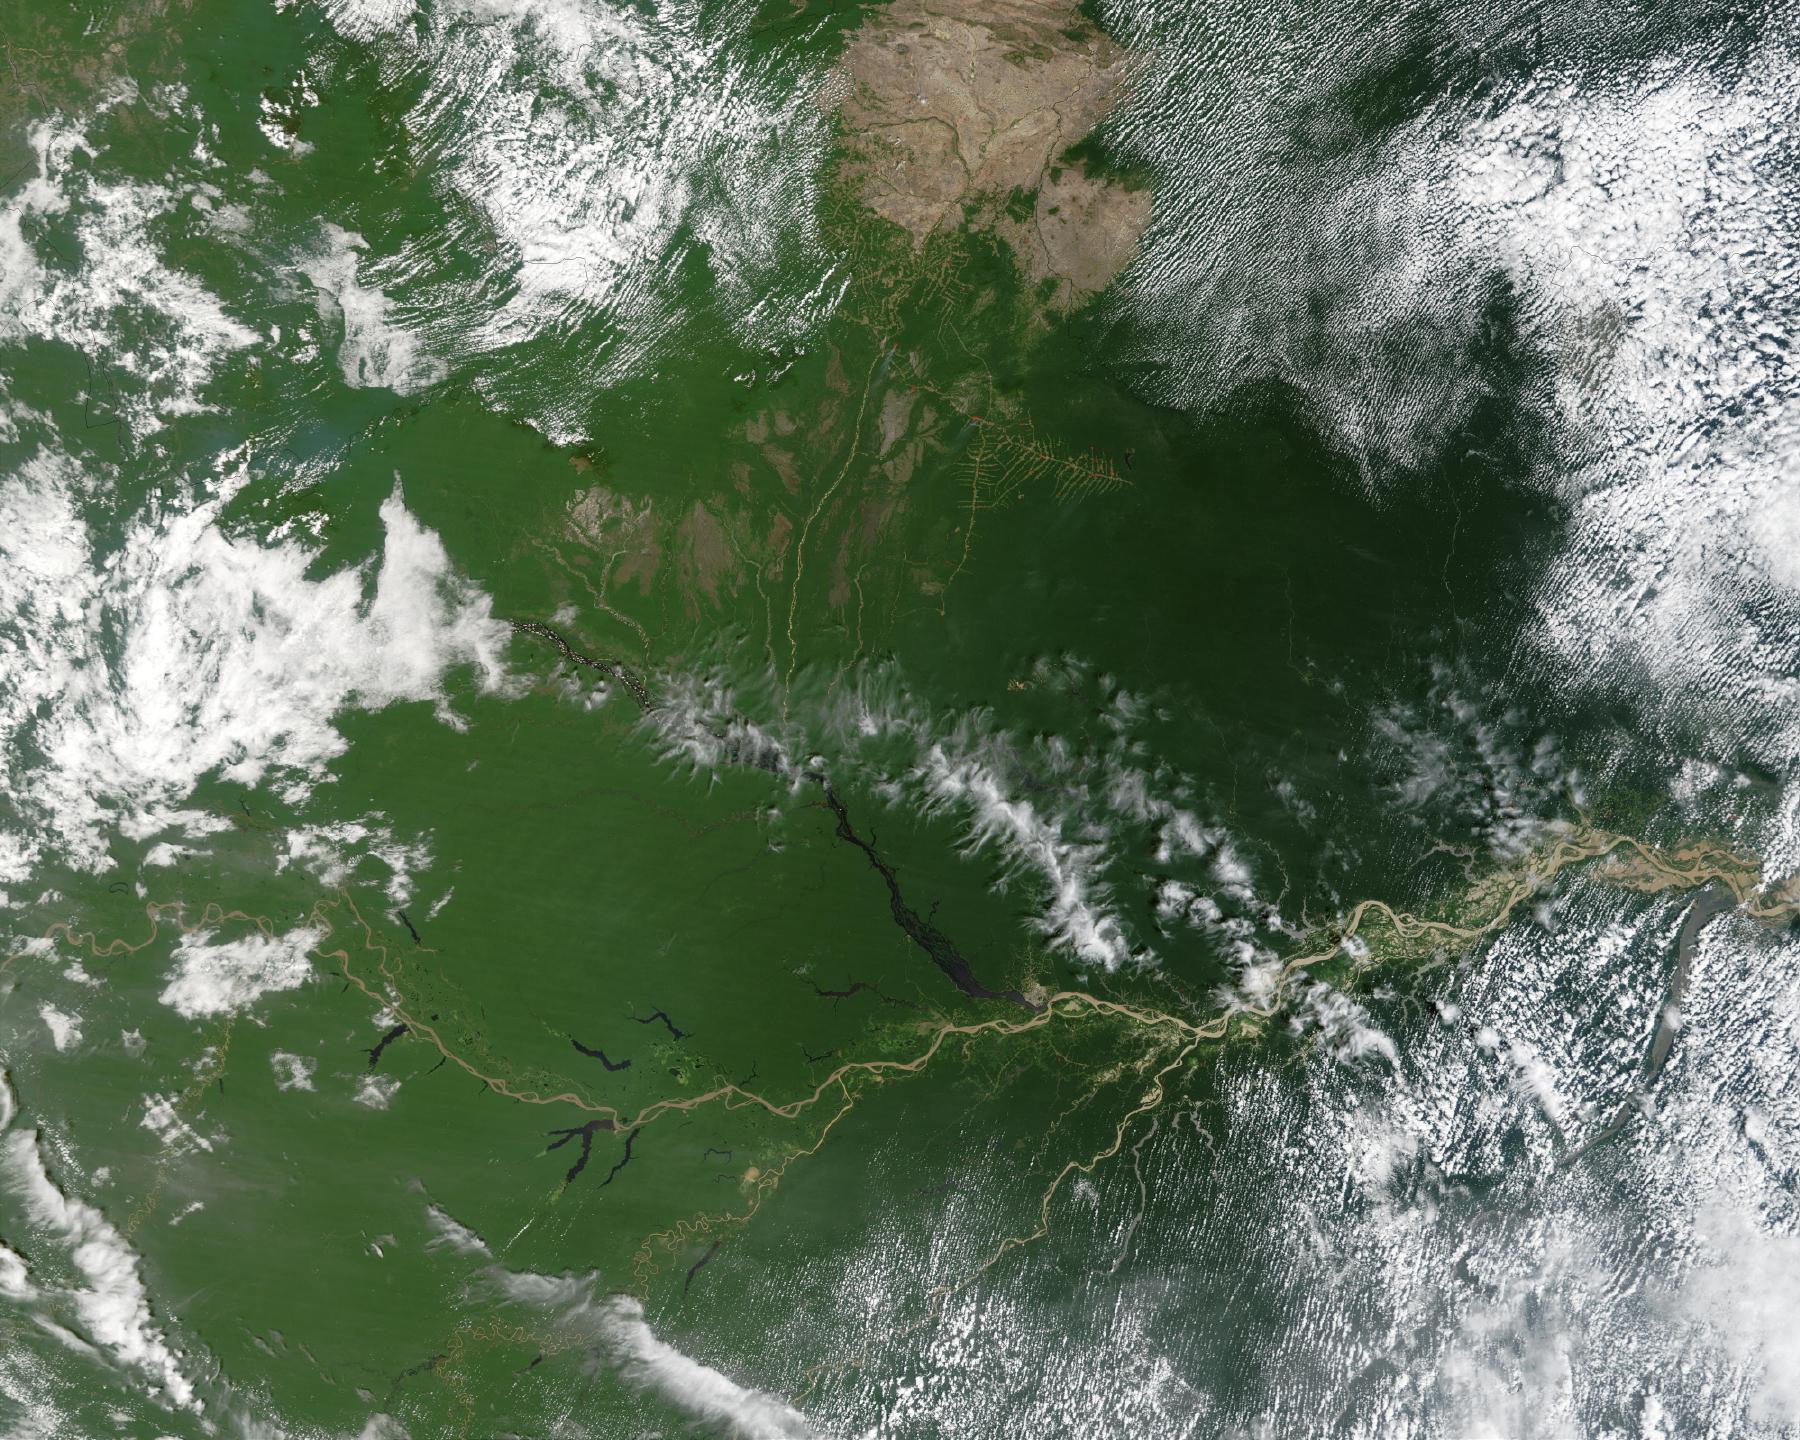 Imagen, Foto Satelite del Rio Amazonas, Brasil